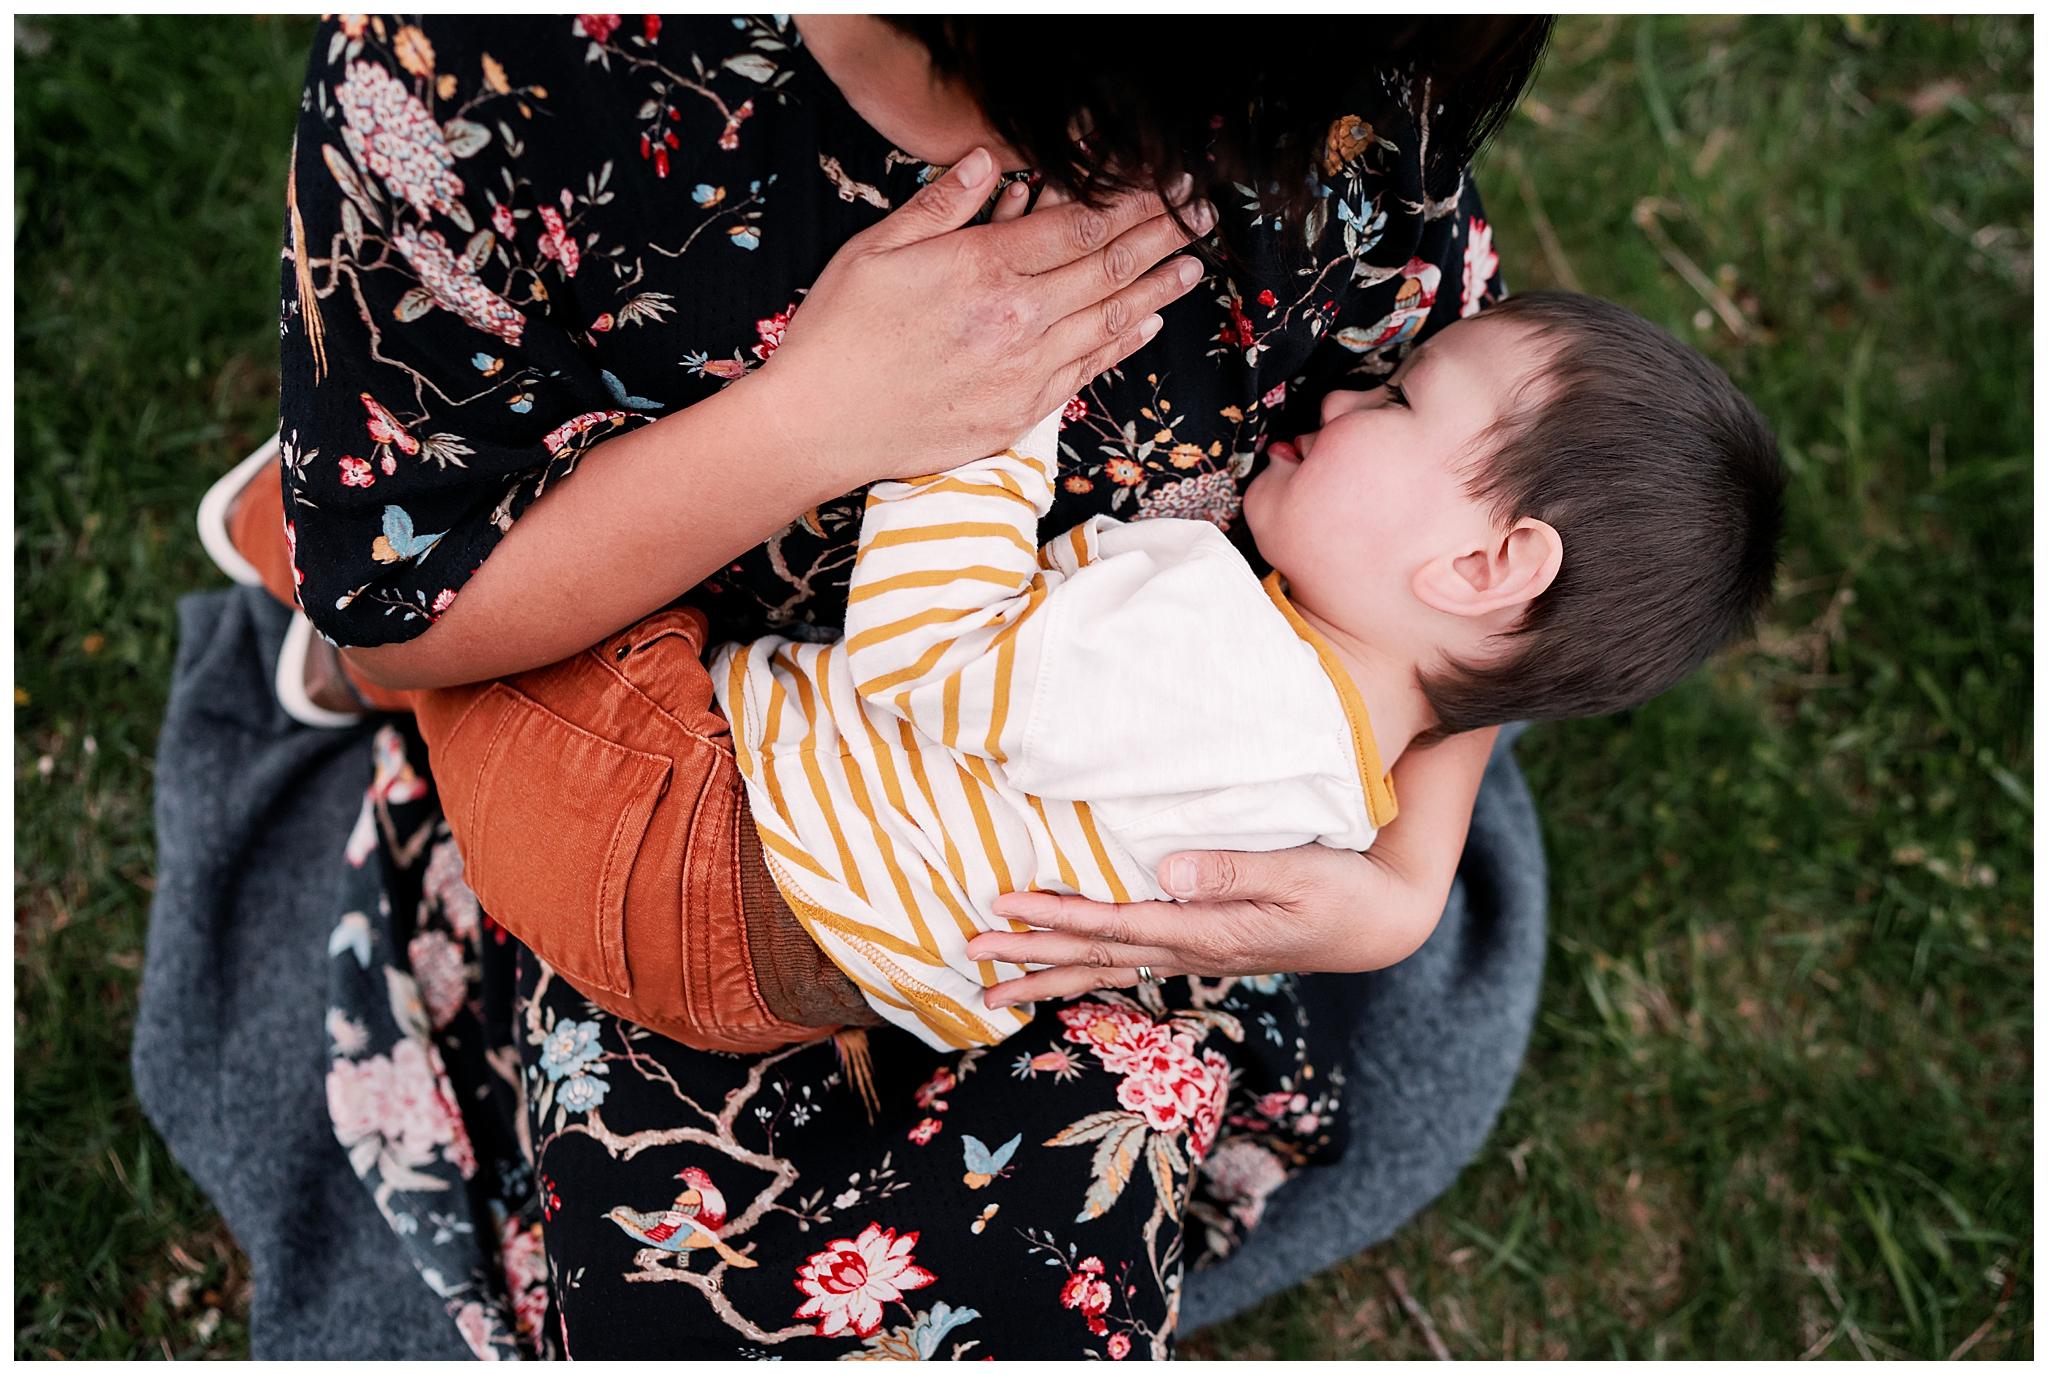 AnneMarie_Hamant_family_photographer_lehigh_valley_pa_0212.jpg